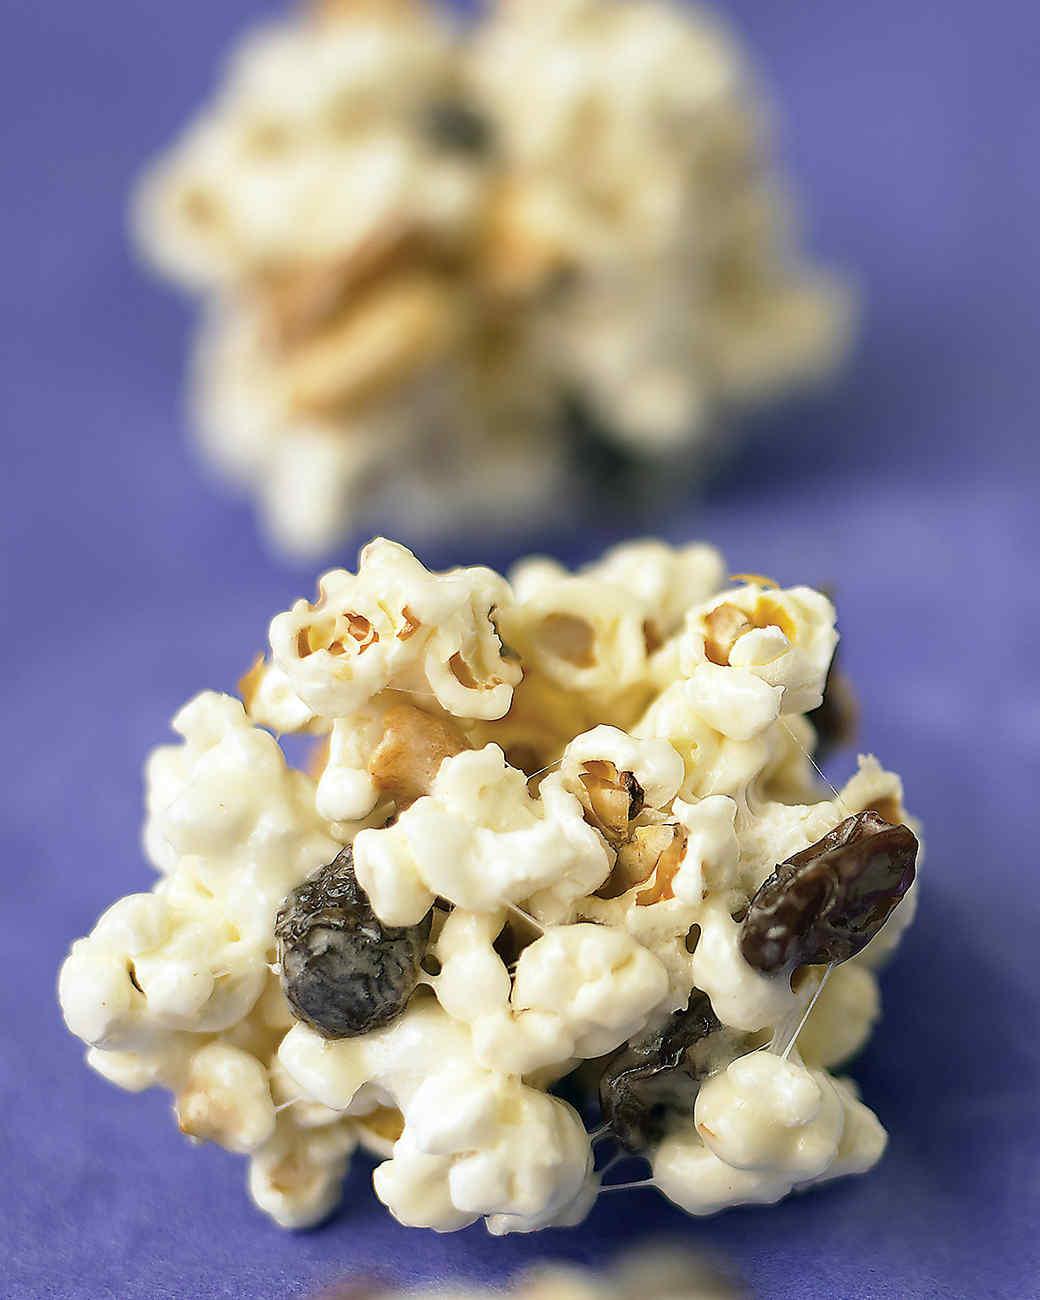 Popcorn Balls with Peanuts and Raisins